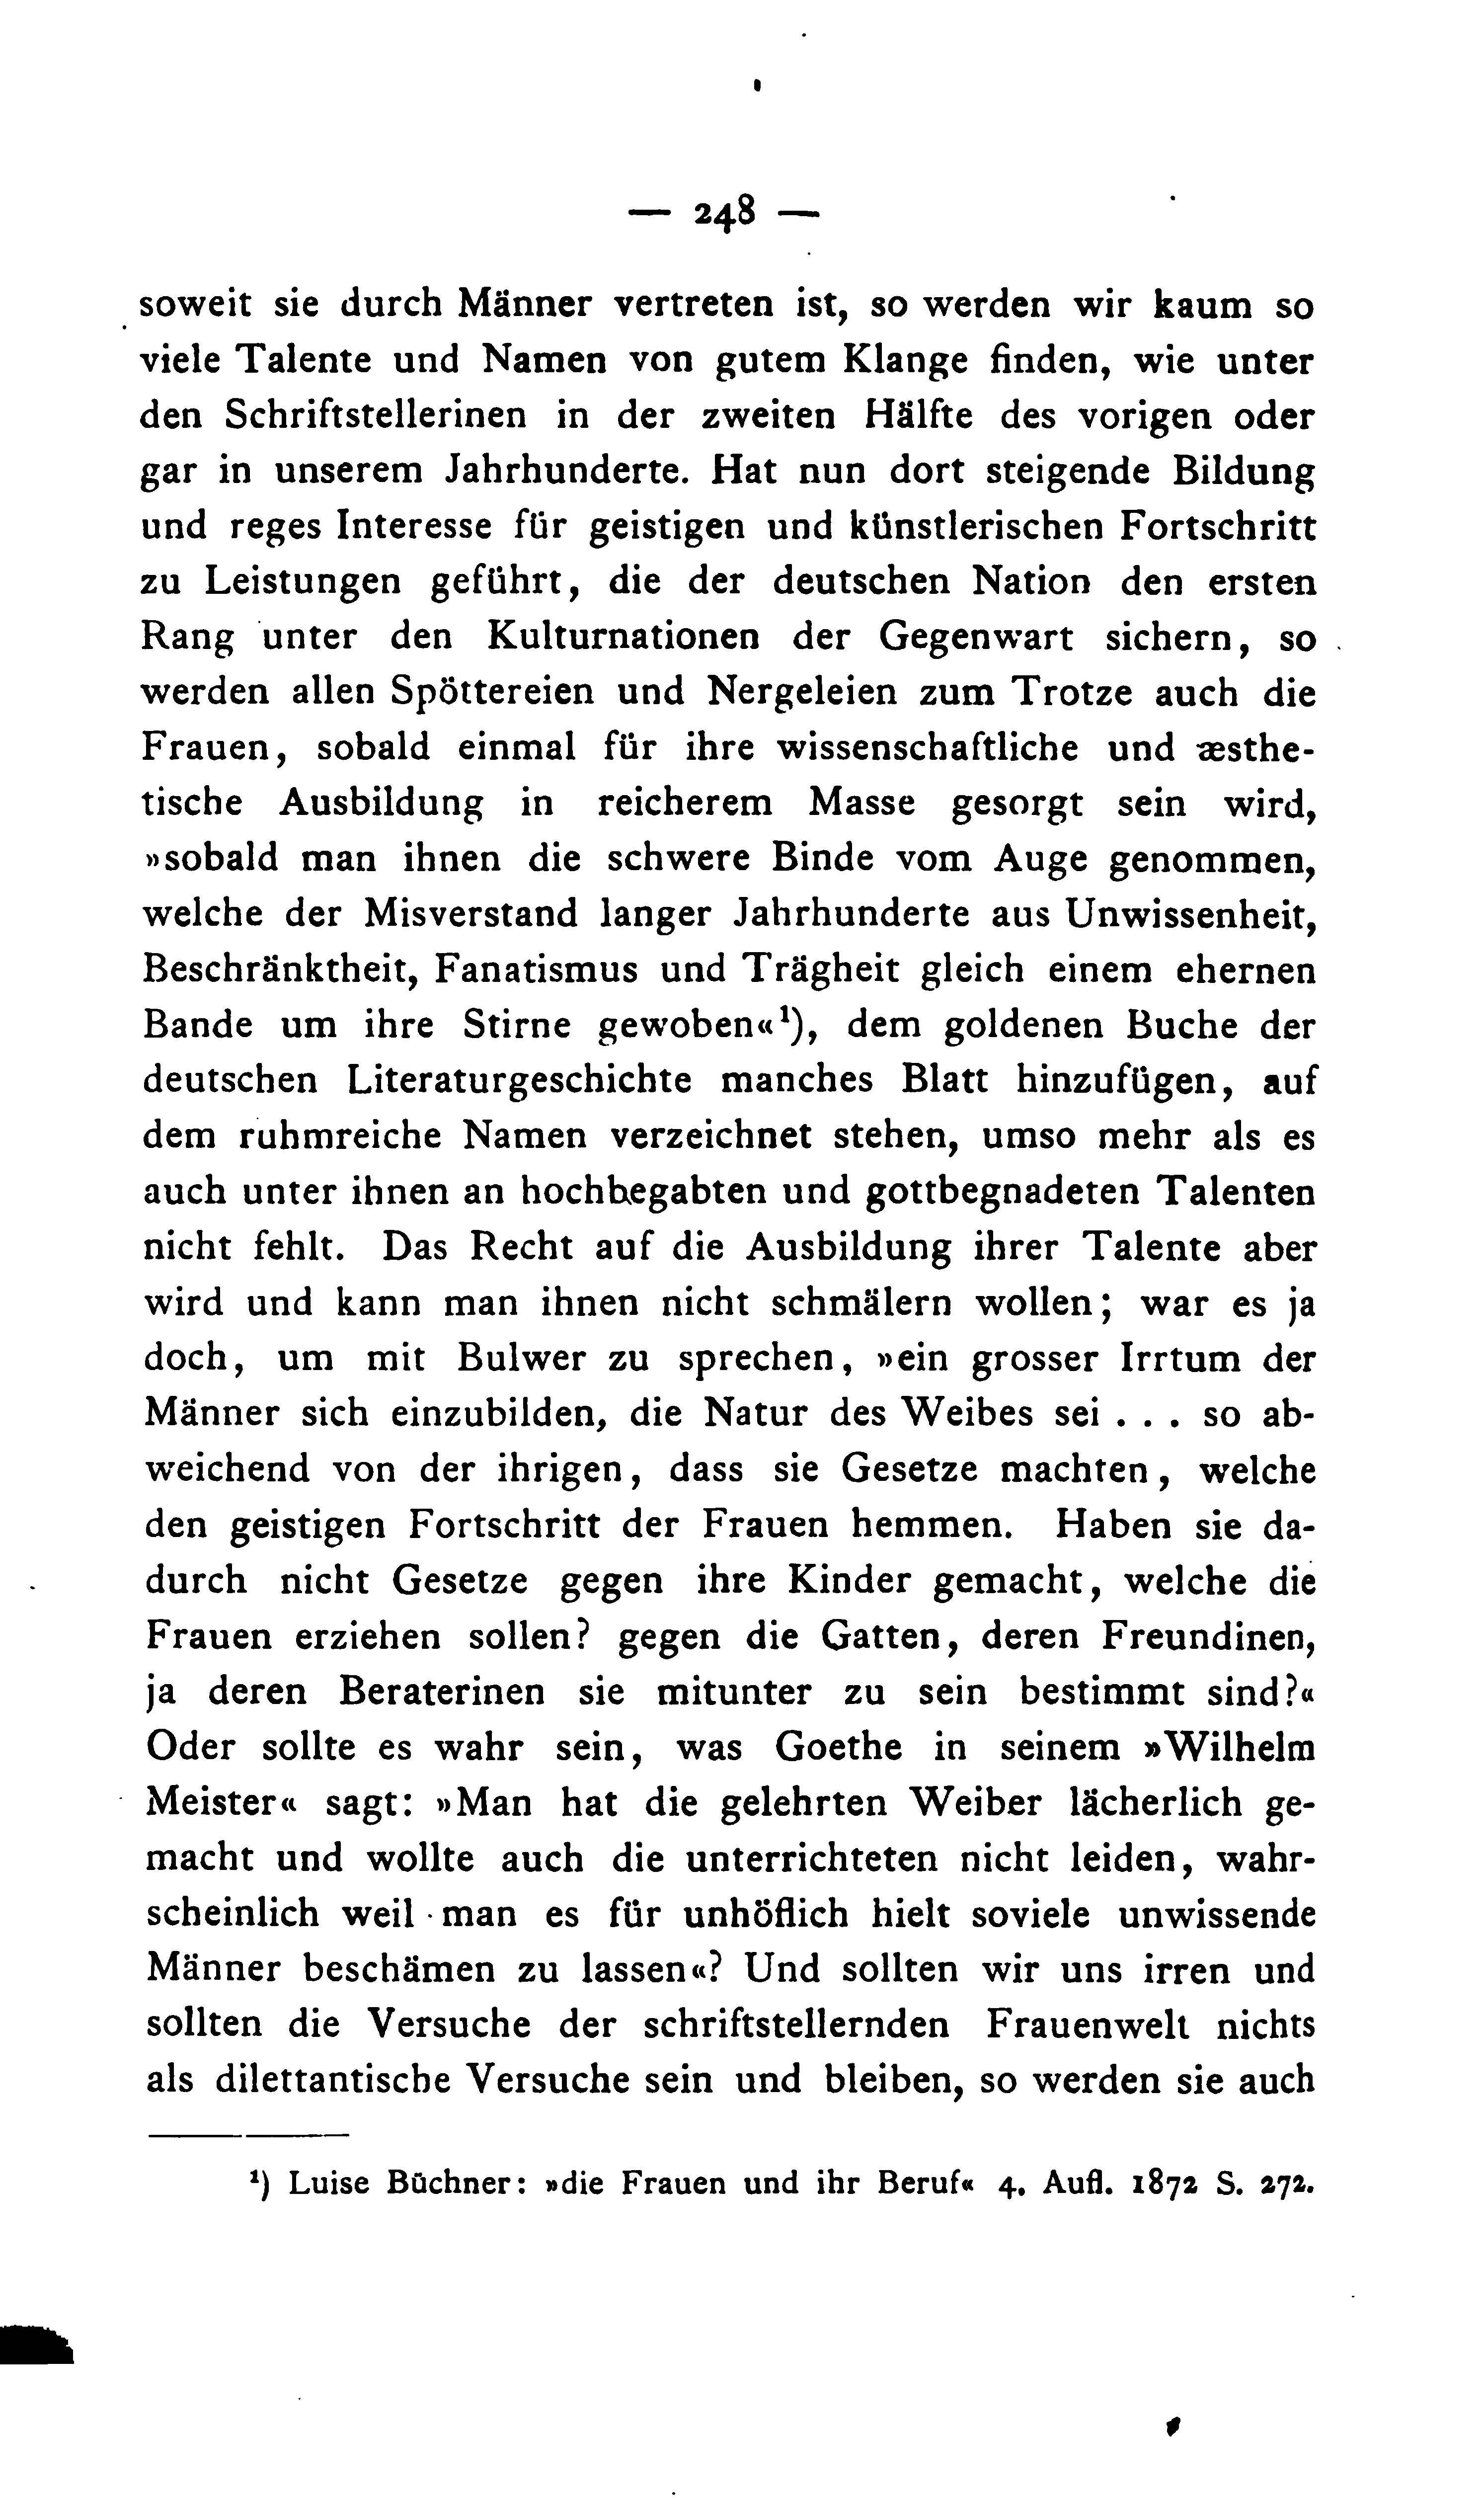 File:DE Gross Dichterinnen 248.jpg - Wikimedia Commons